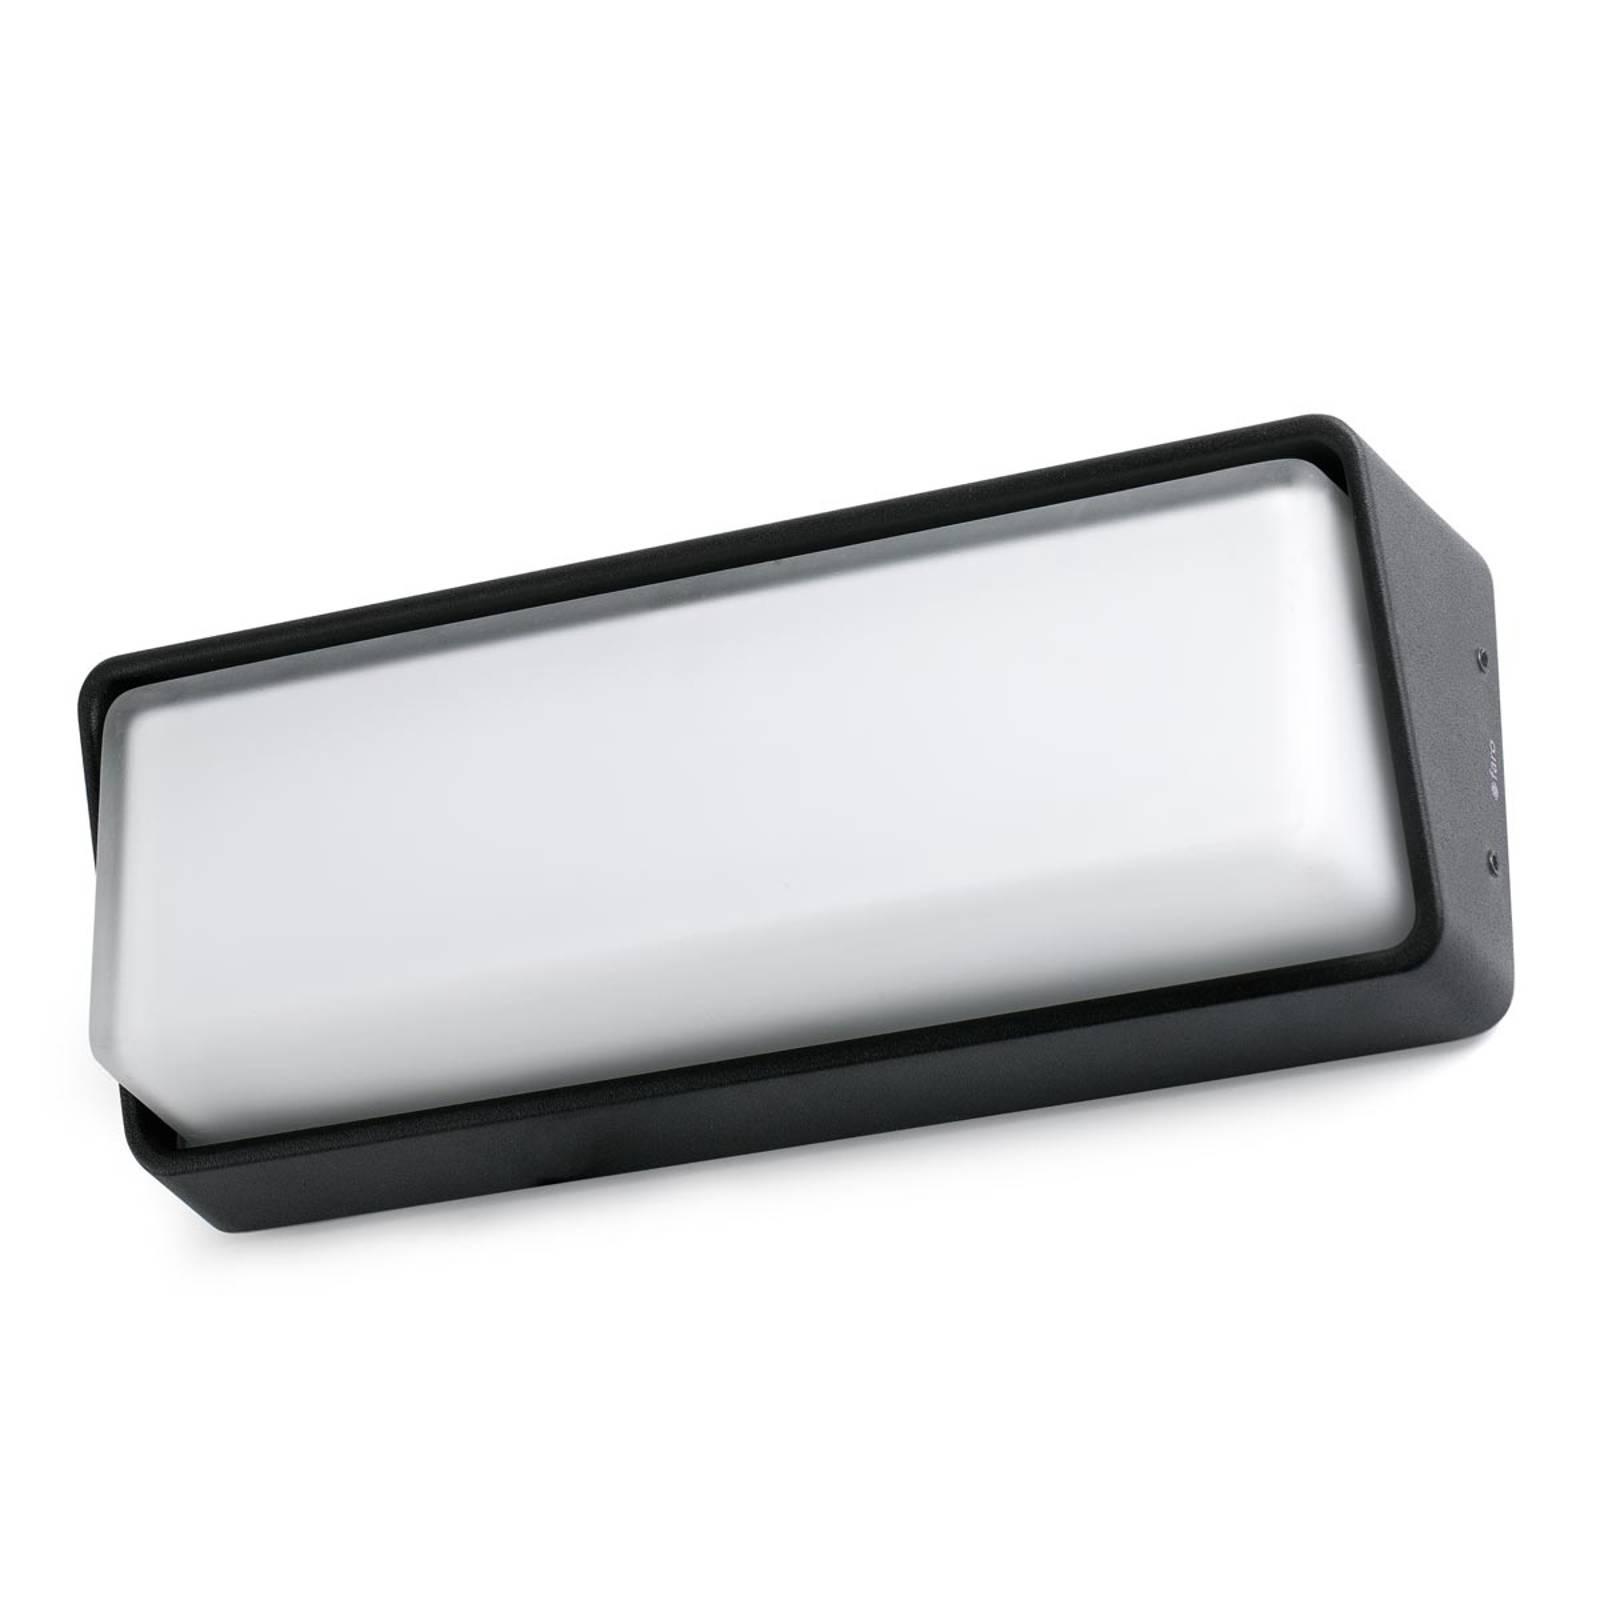 Tijdloze buitenwandlamp Half met LED-licht